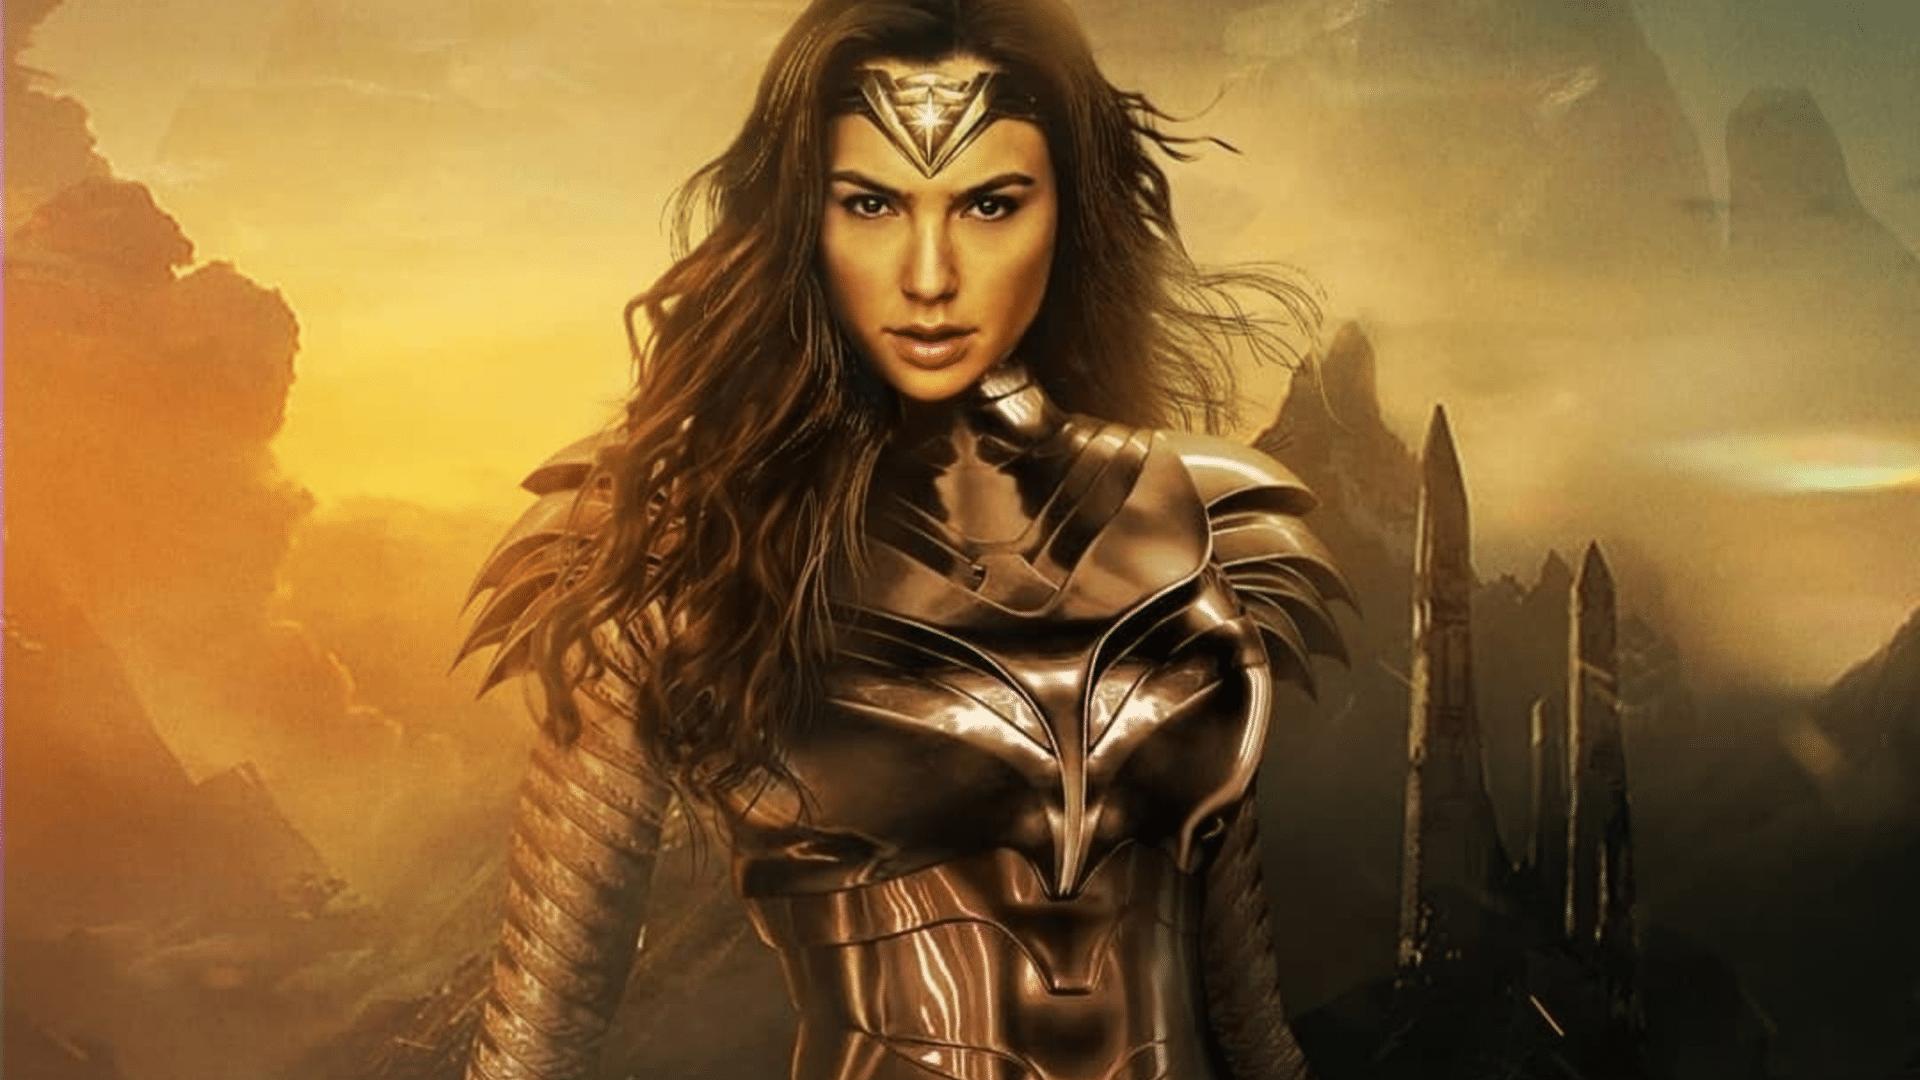 A look at the upcoming Wonder Woman 1984 Film